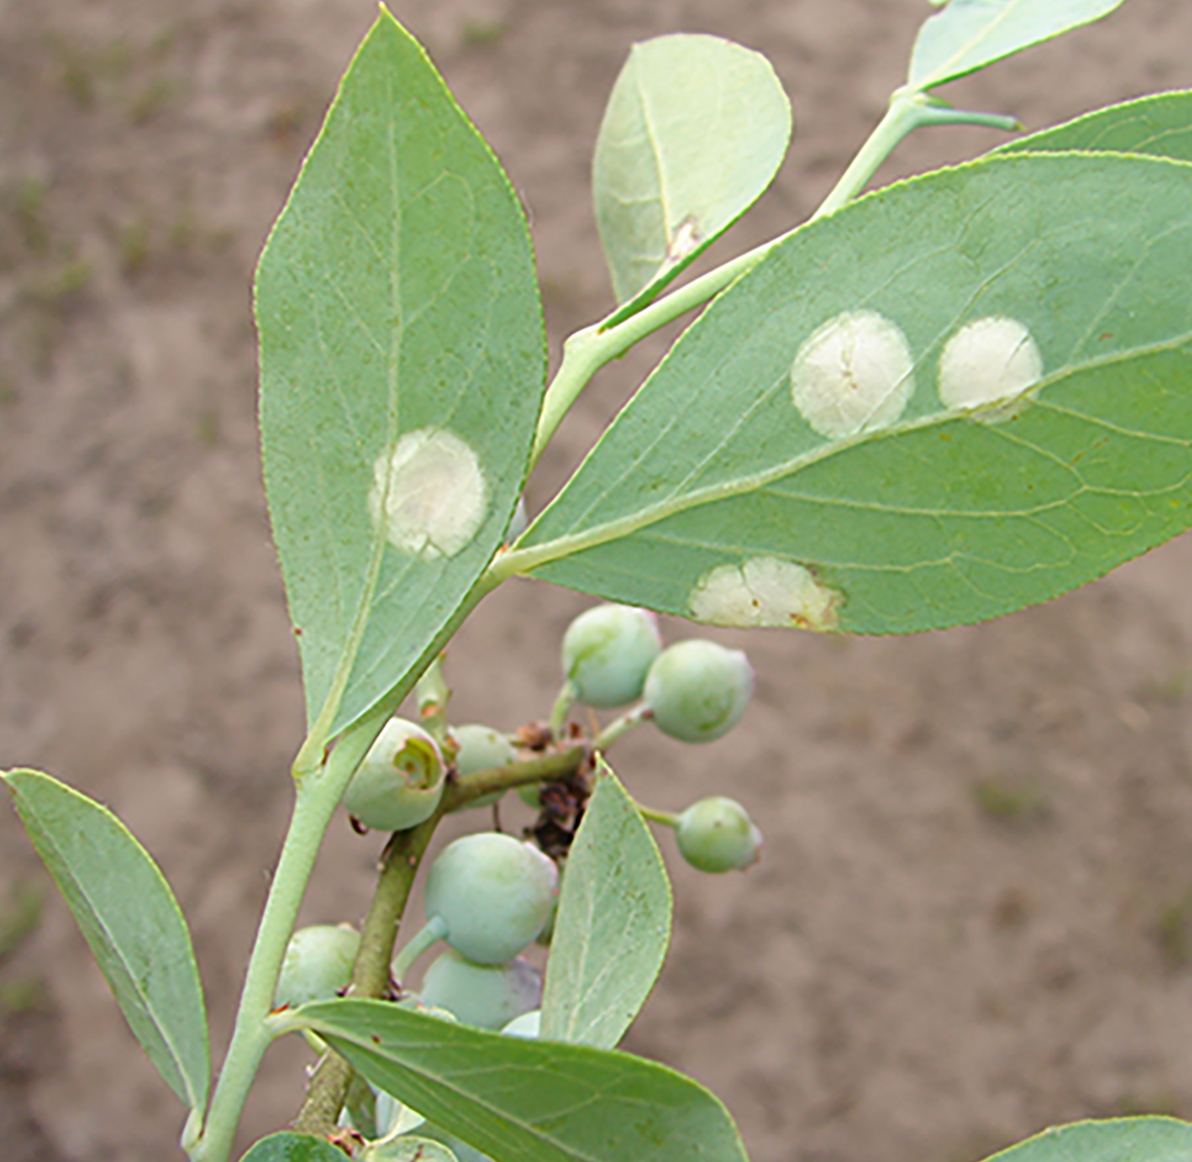 Pictured is Exobasidium leaf spot disease on blueberries.